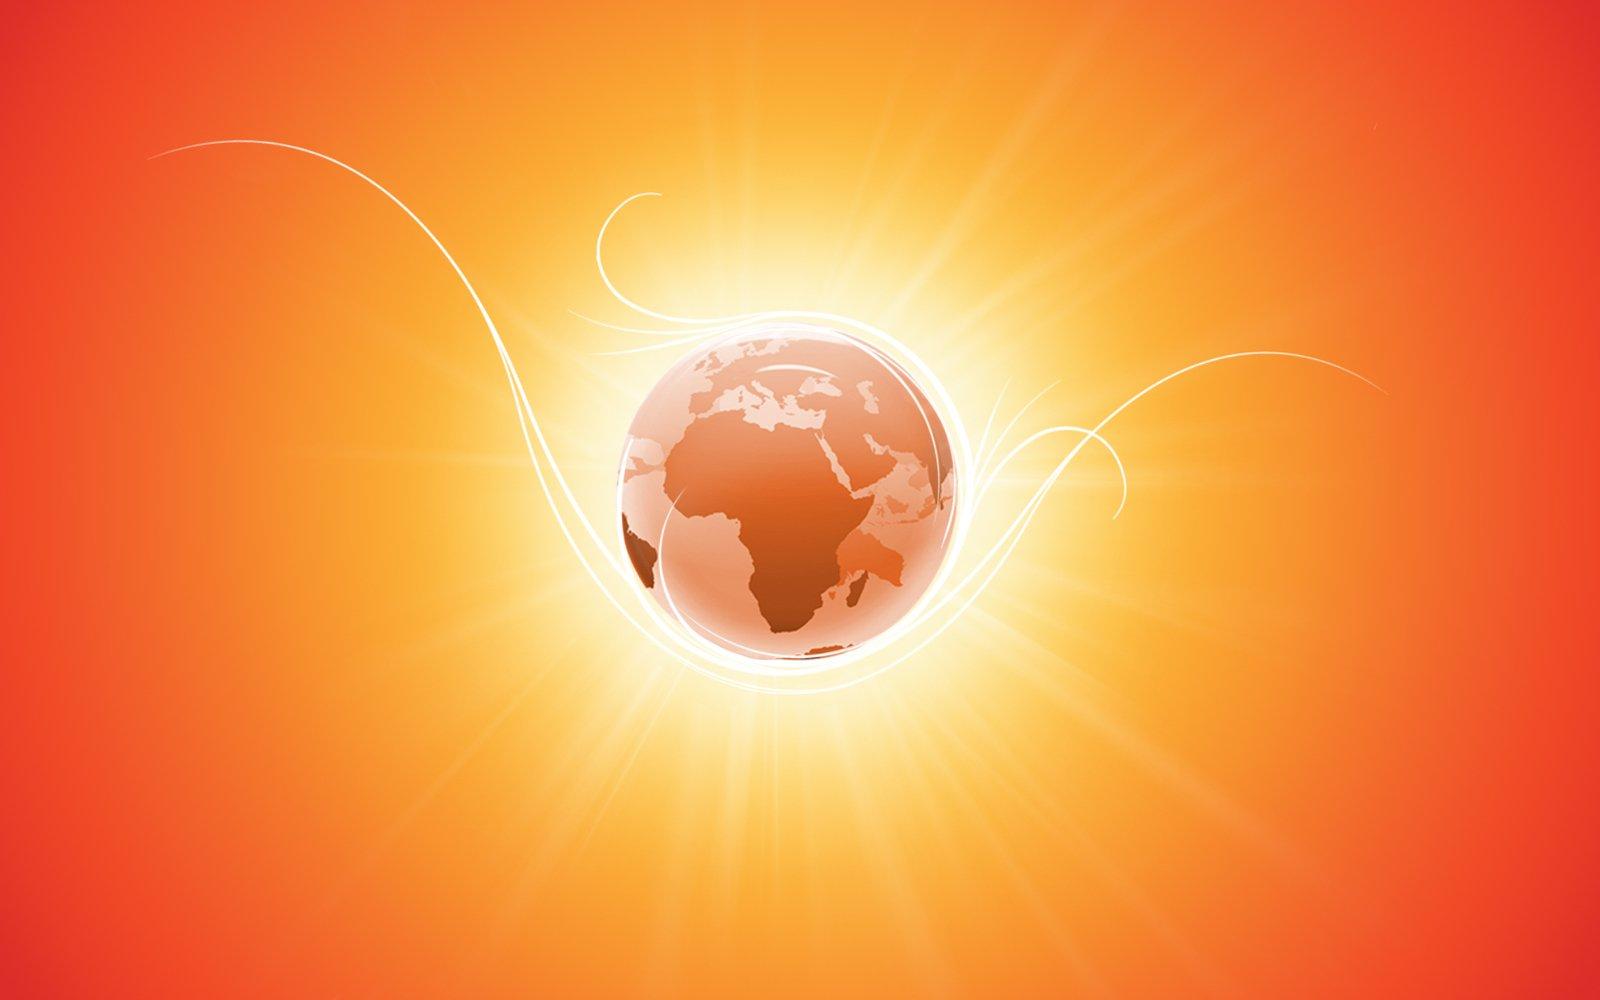 global warming art